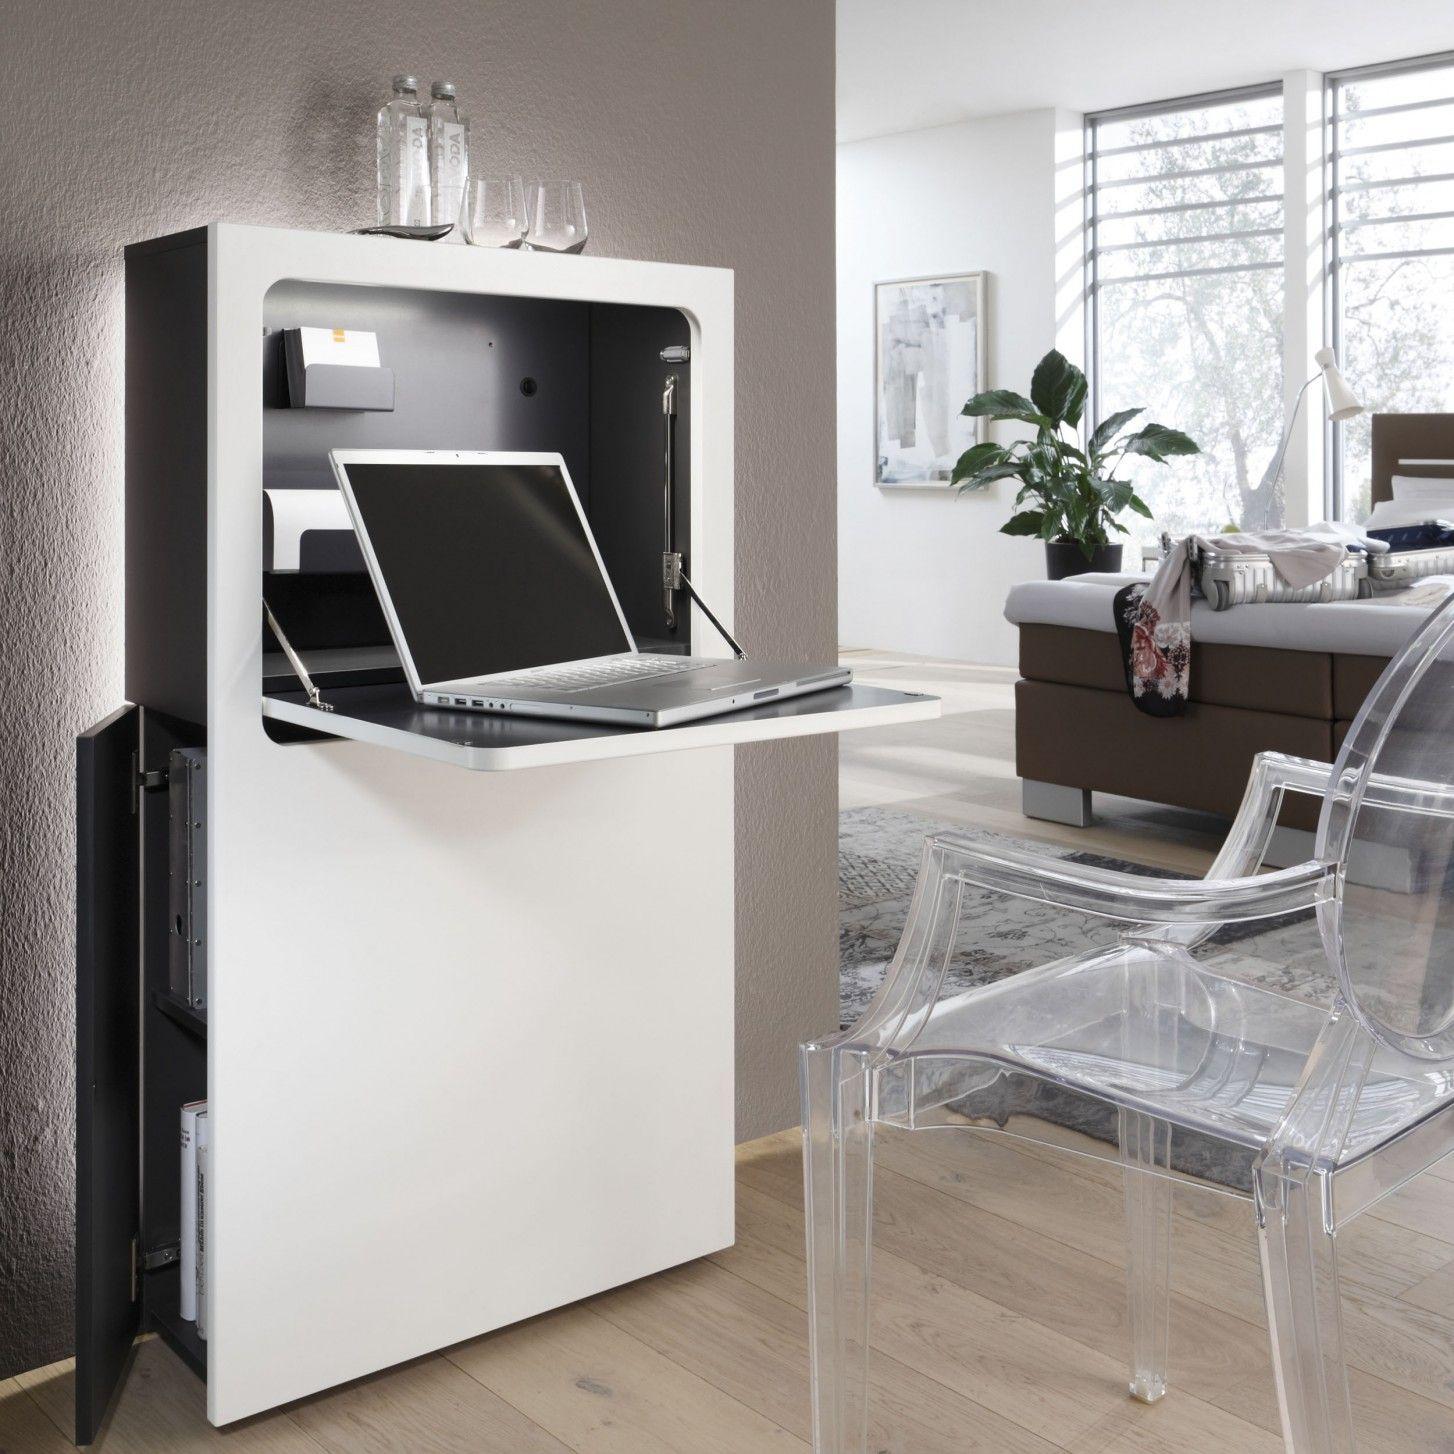 smaider sekret r von urban favourites bei m bel pinterest design shop and urban. Black Bedroom Furniture Sets. Home Design Ideas